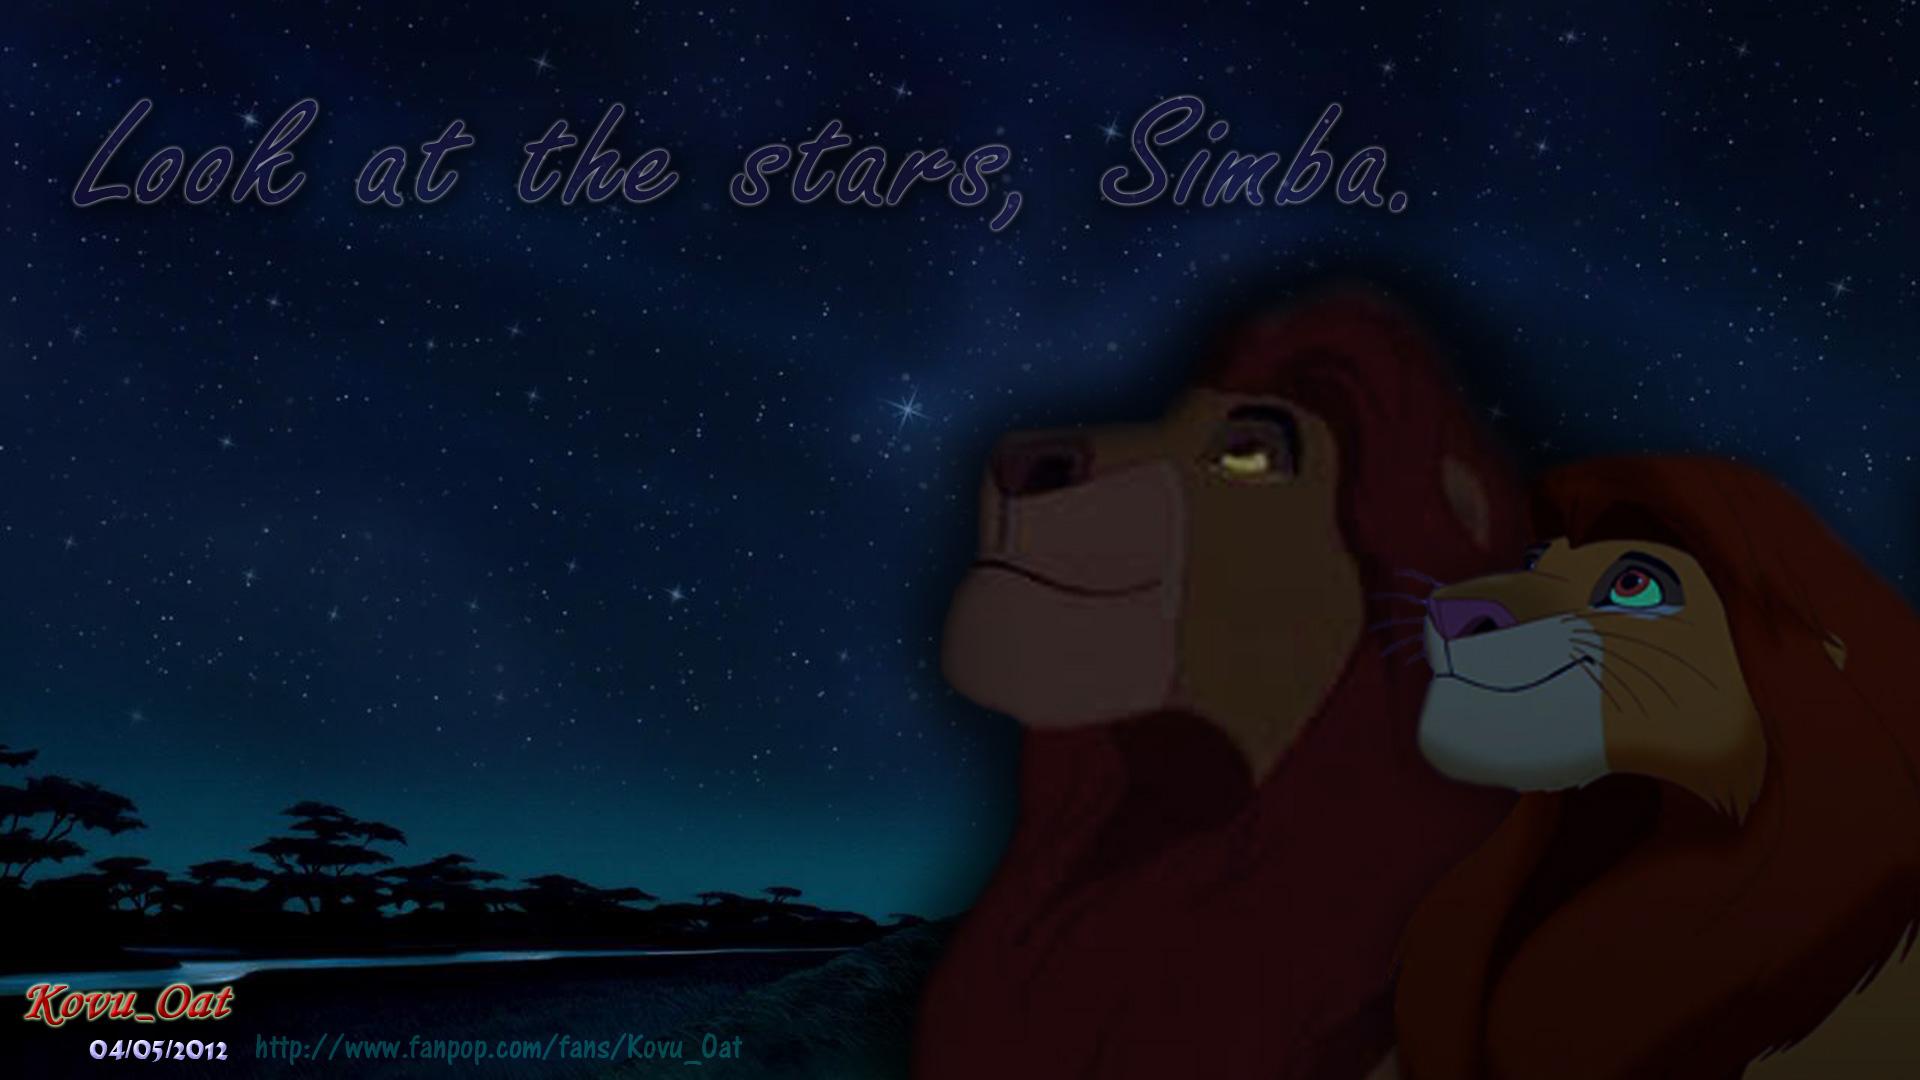 Mufasa and Simba night star Wallpaper HD 2   The Lion King Wallpaper 1920x1080